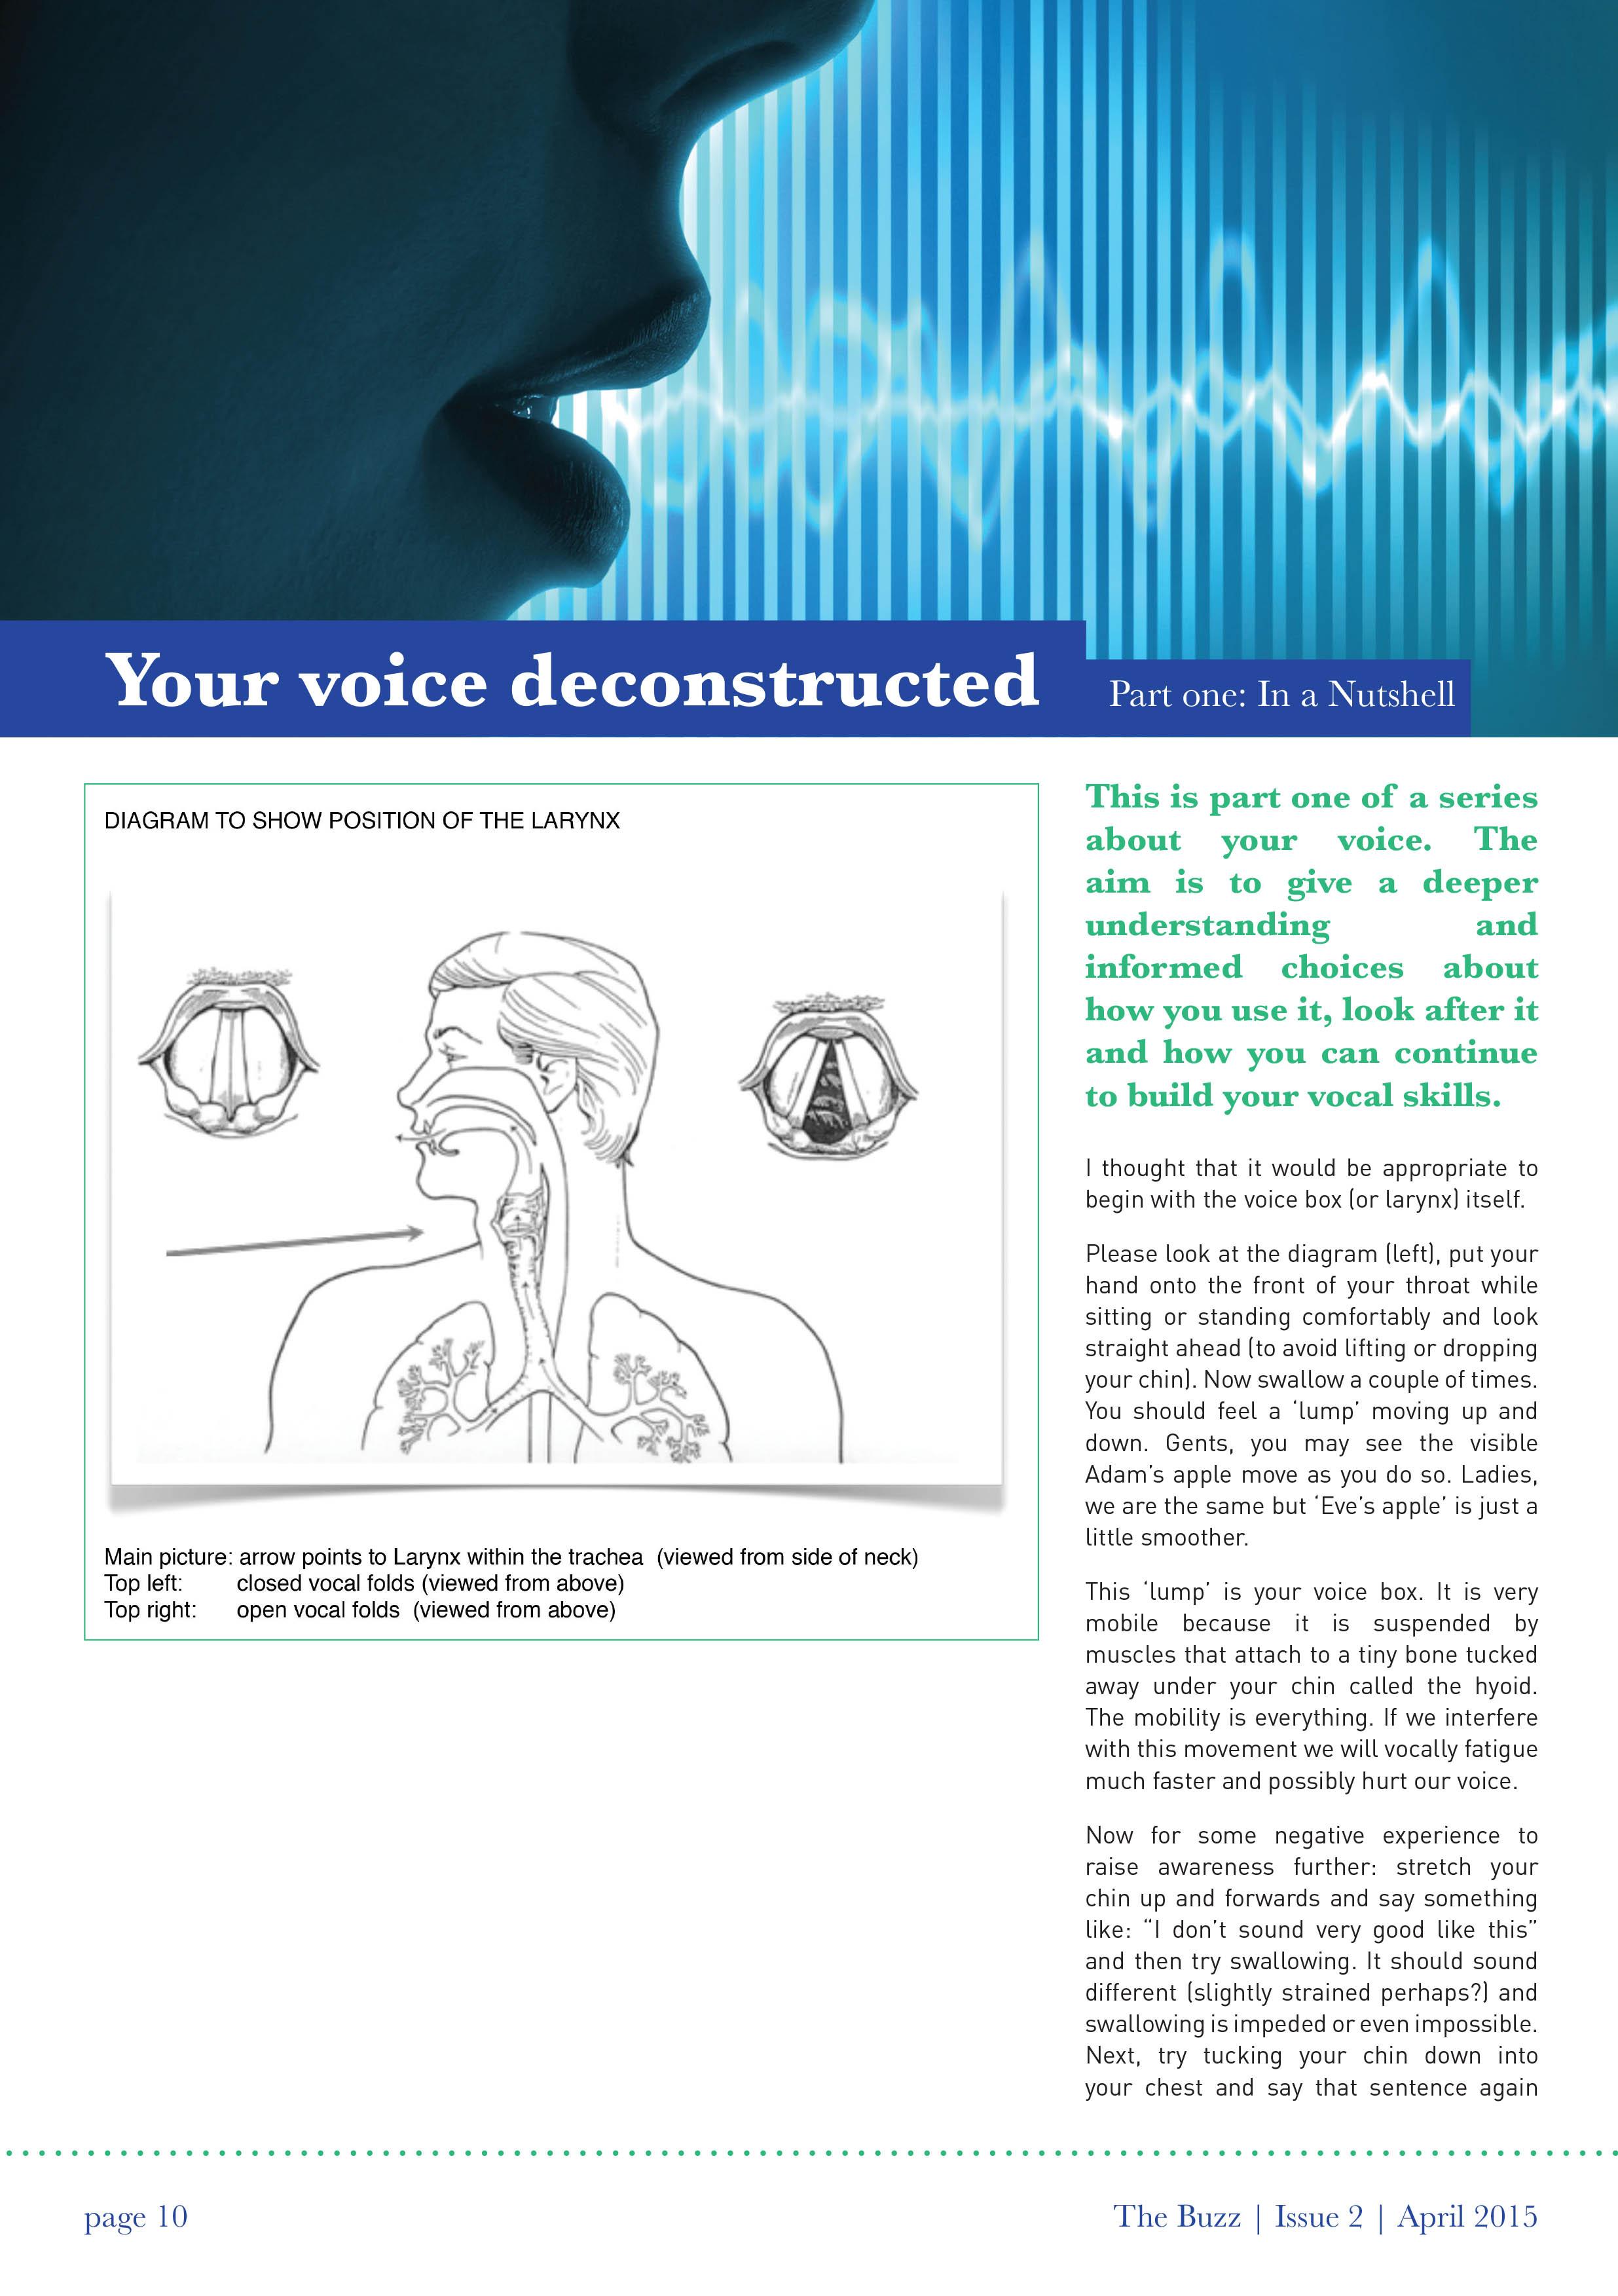 Your Voice Deconstructed – Part 1 Article